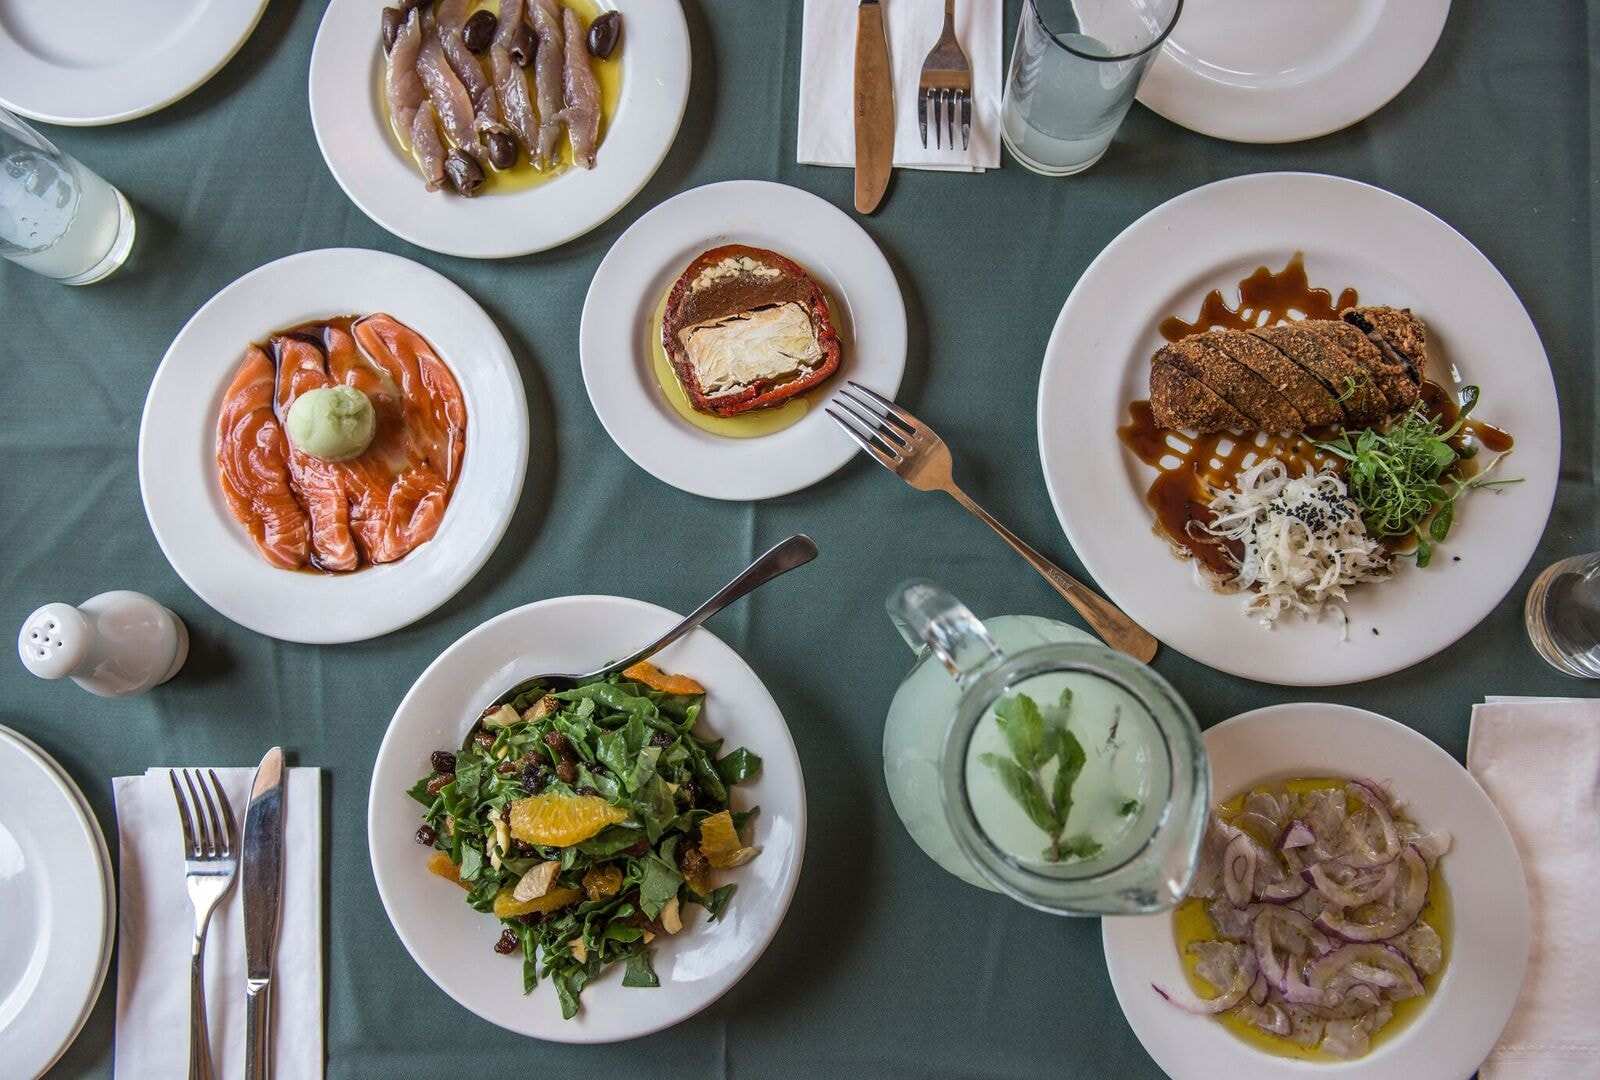 Sivan_Askayo-Uri_Buri_Restaurant_High_Rez_-12_preview